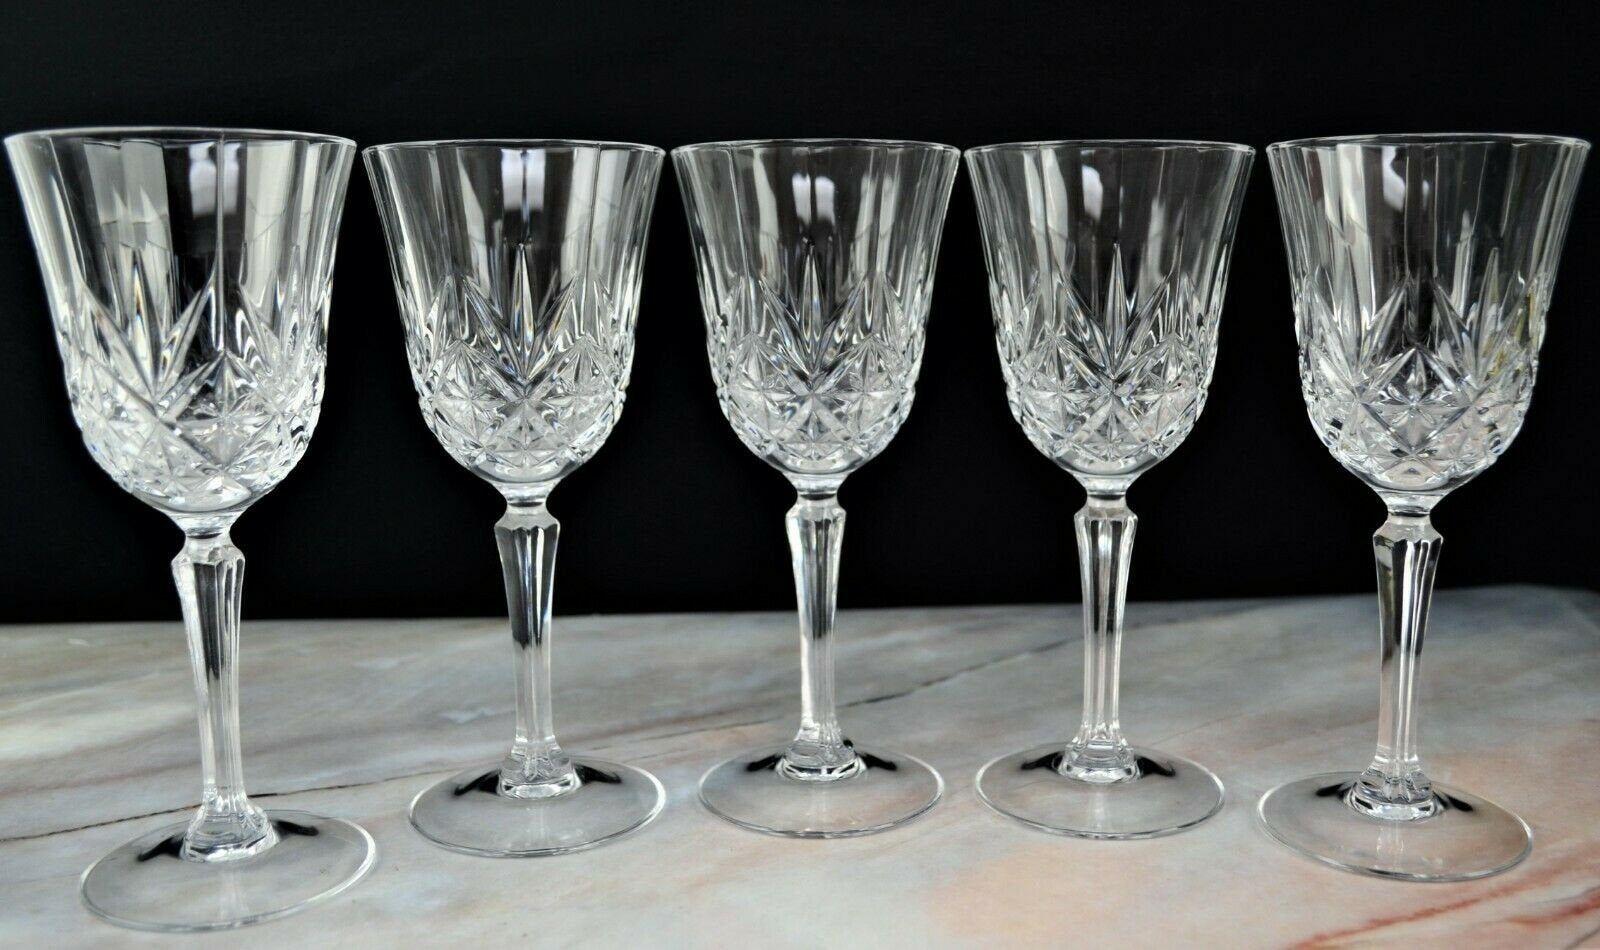 5 Cristal D Arques Wine Glasses Crystal Glass Durand Etsy Crystal Wine Glasses Arques Wine Glass Set